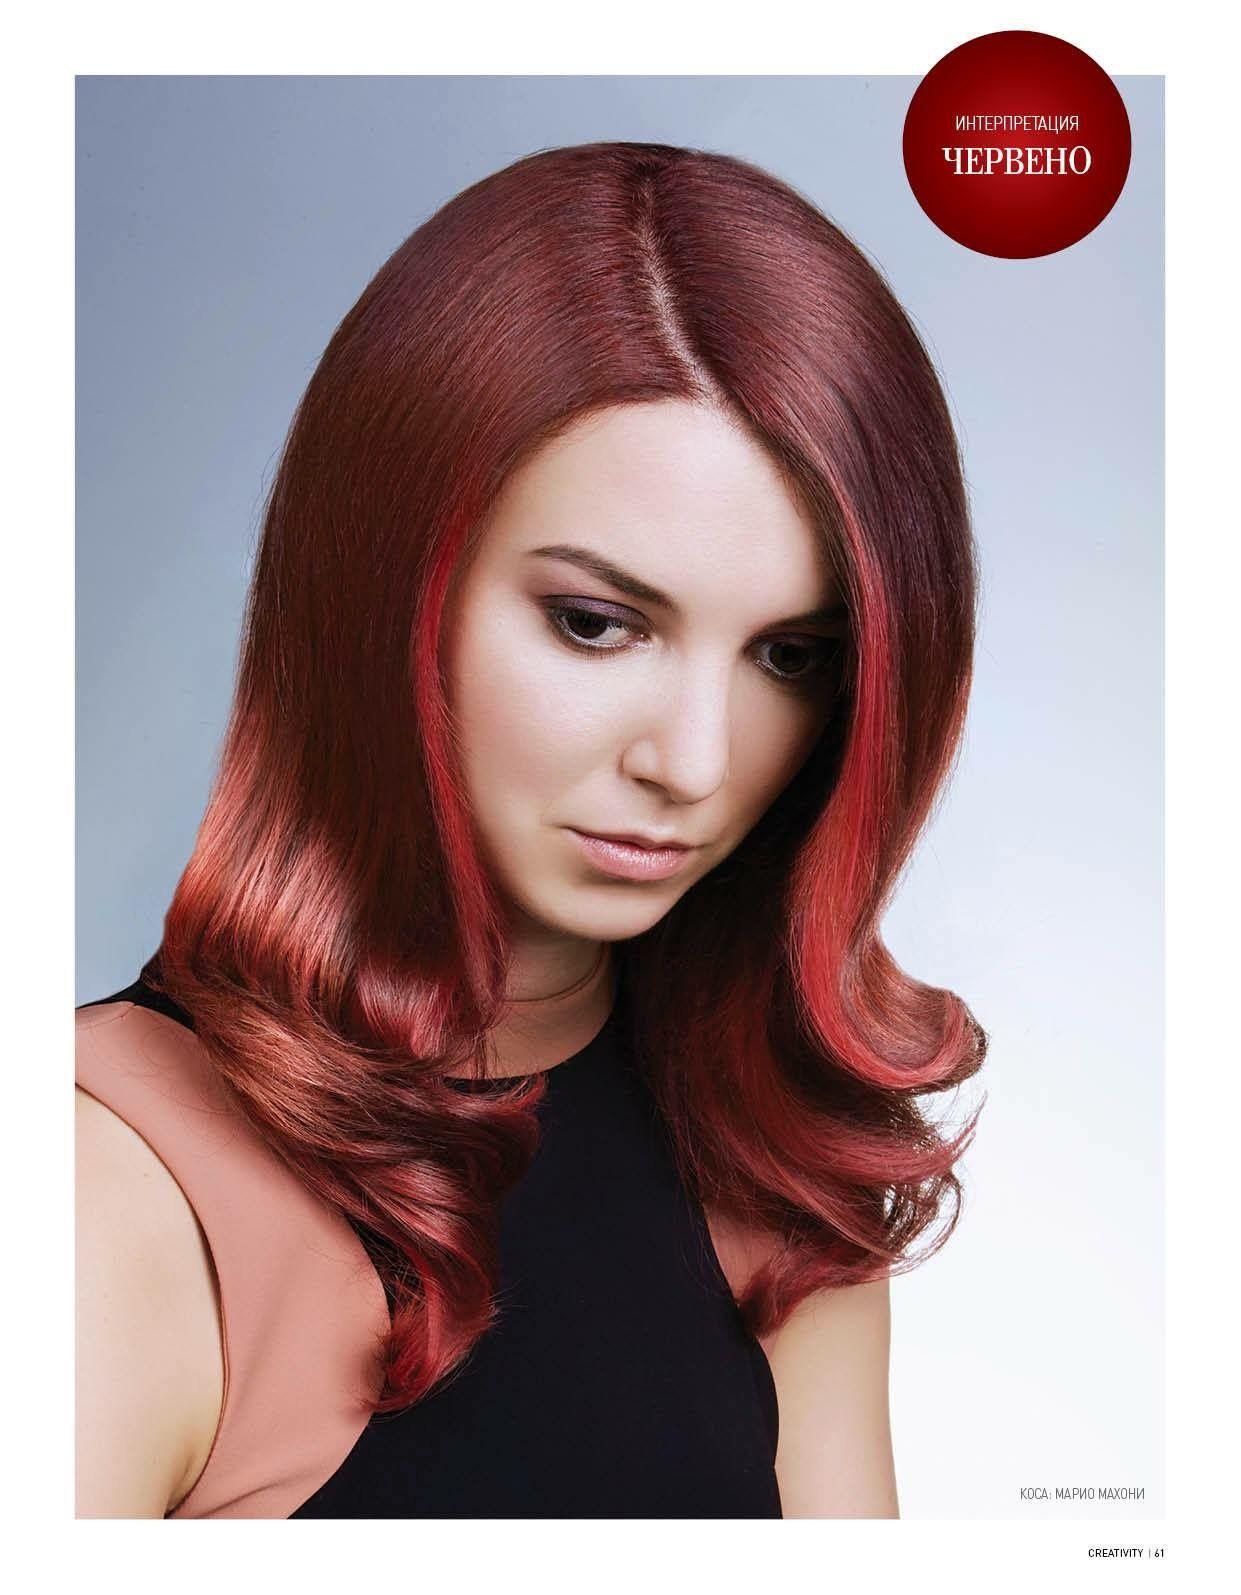 Pin by Krasimira Petrova on Book Creativity 2014 L'Oreal ...  |Bulgarian Hair Fashion